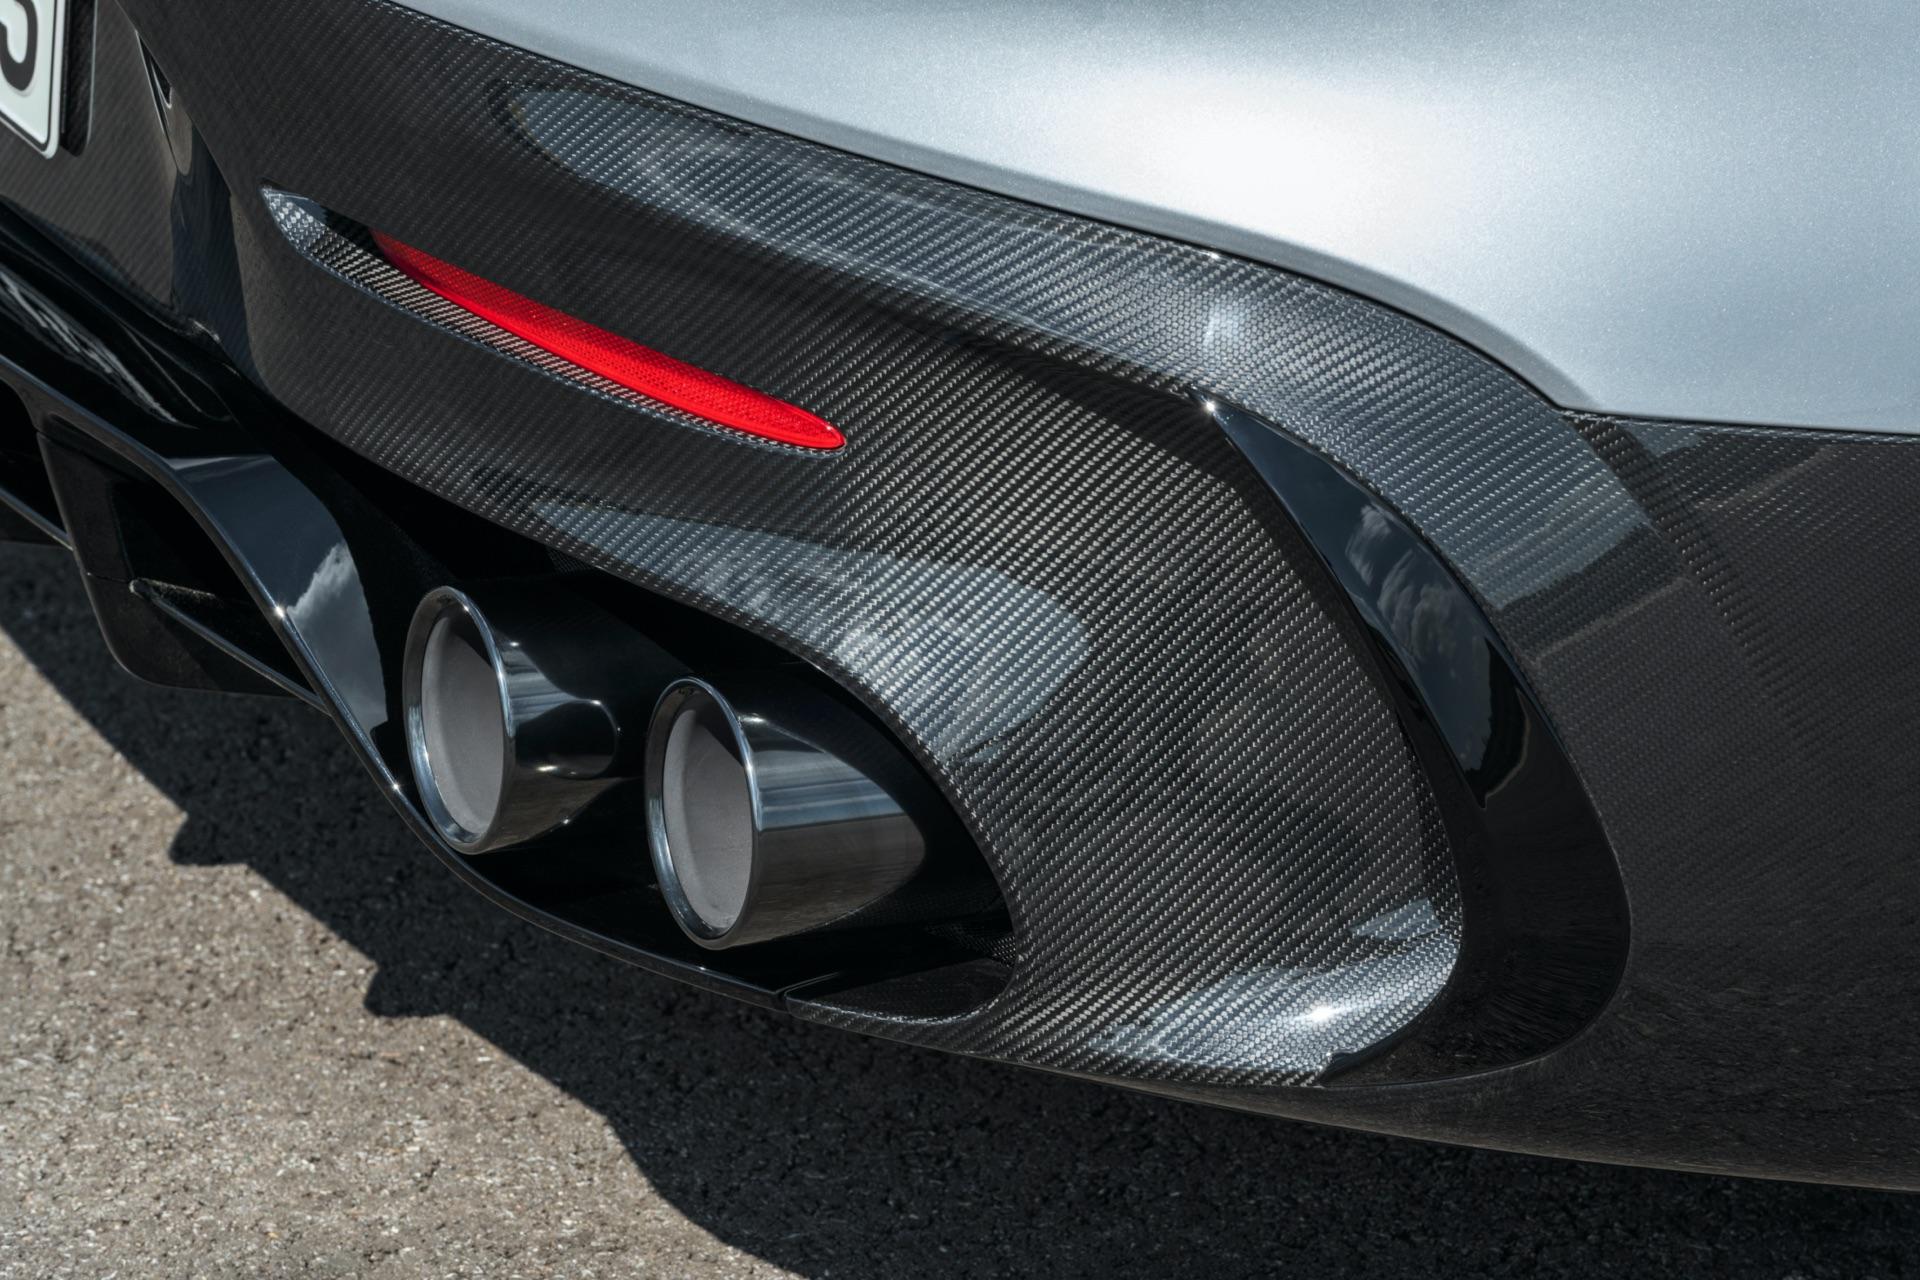 Mercedes-AMG GT Black Series Exhaust